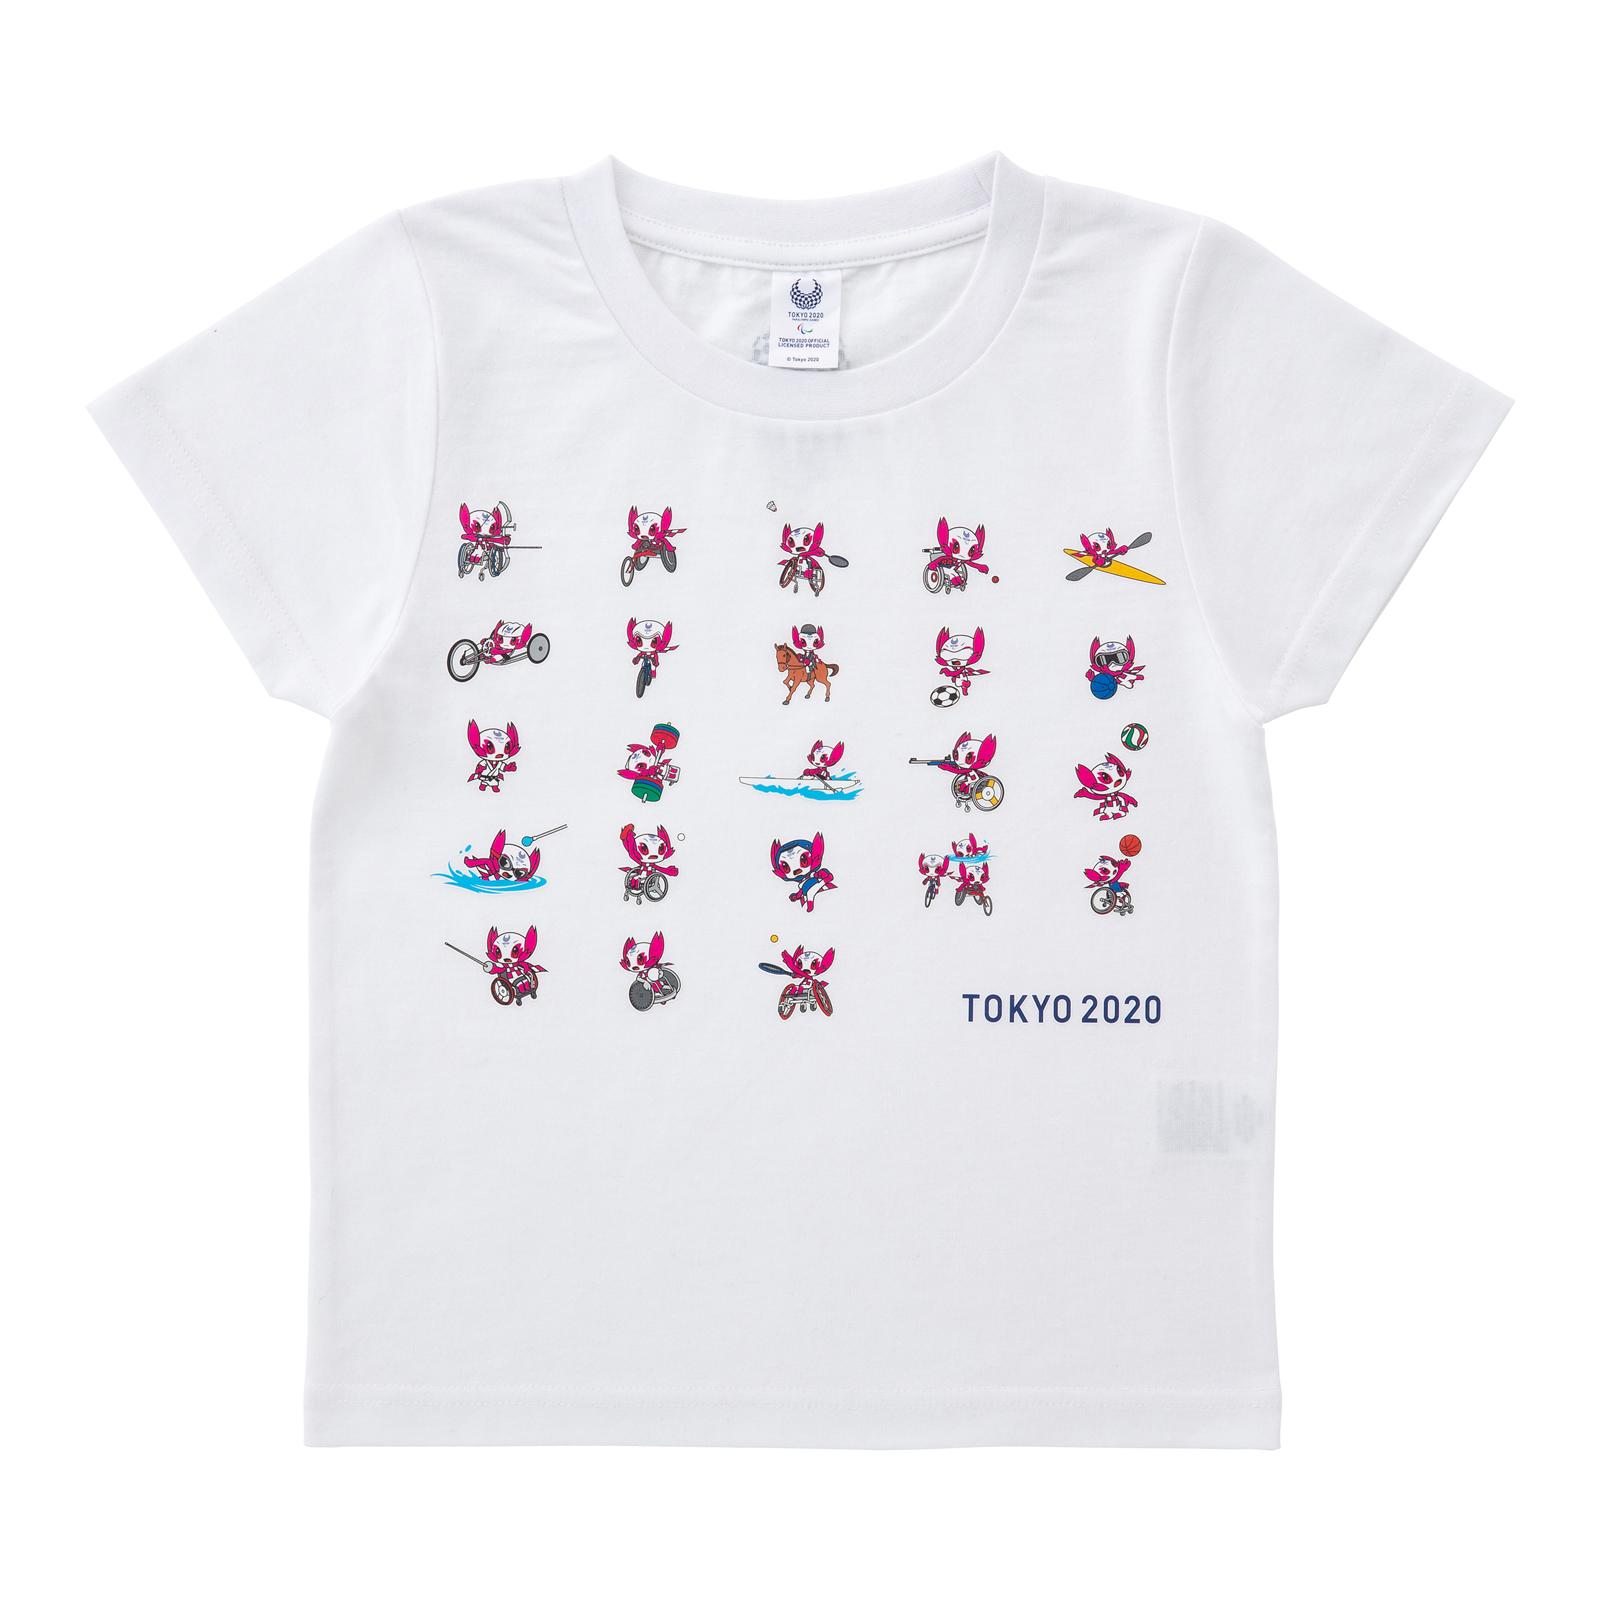 KIDS Tシャツ全競技ポーズ (東京2020パラリンピックマスコット)